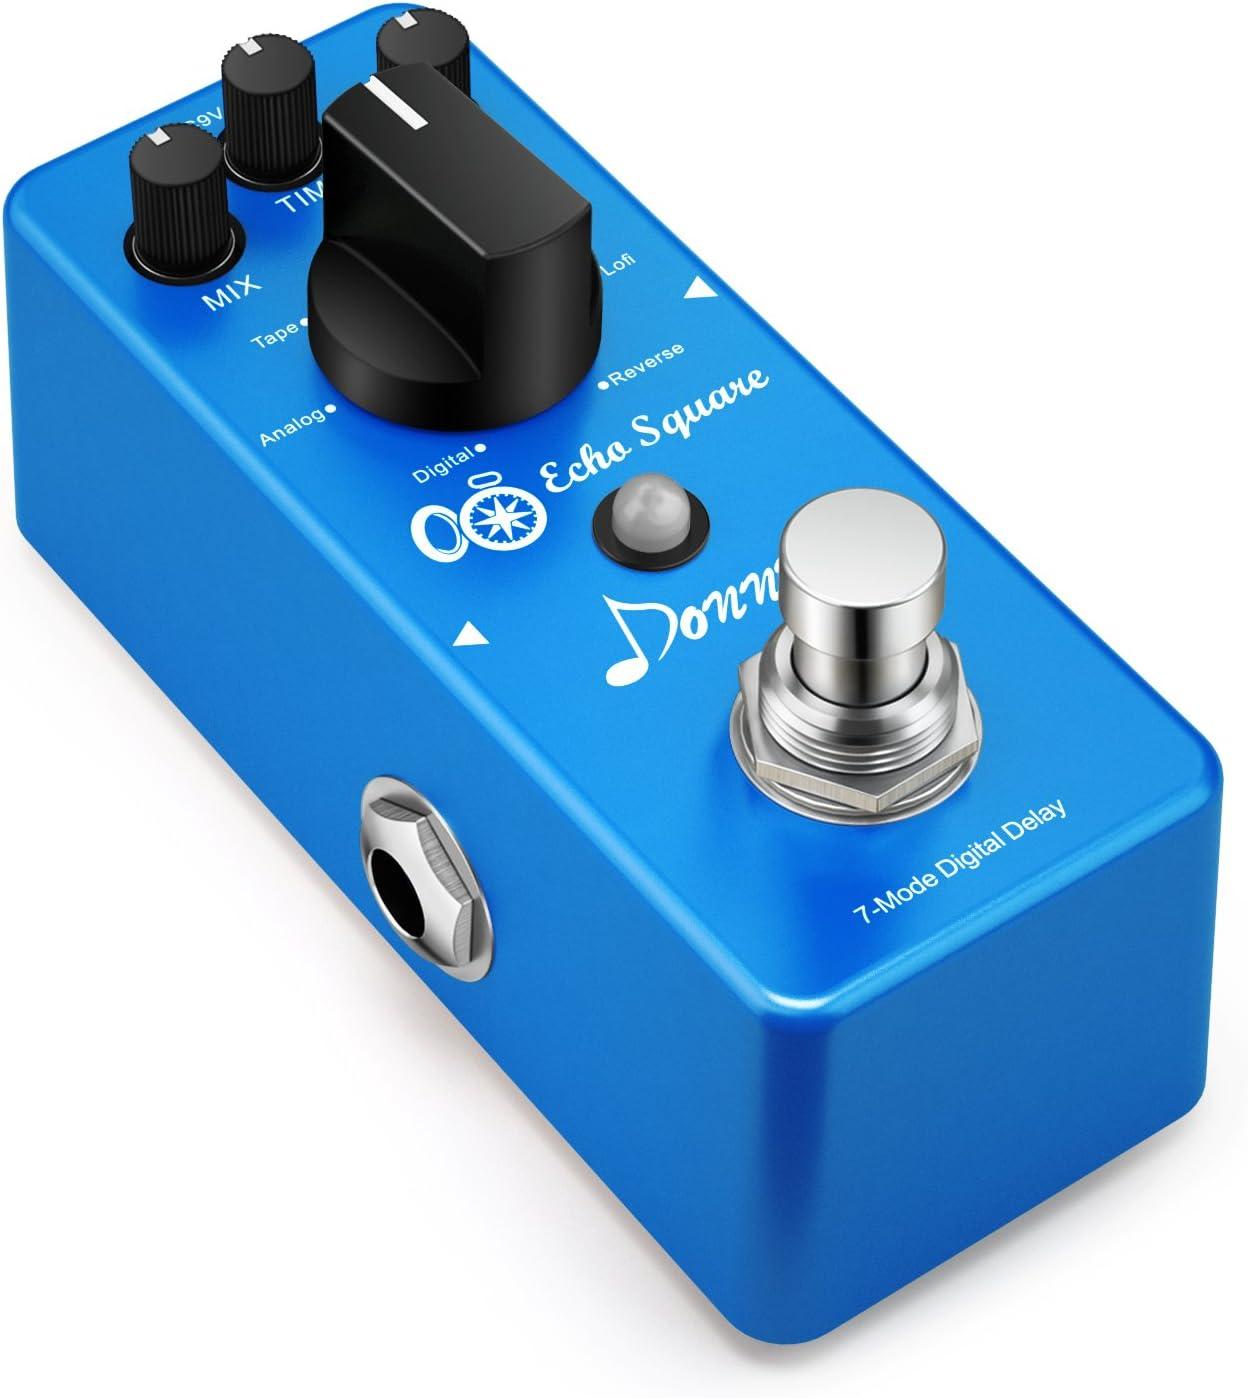 Donner Echo Square Digital Delay Pedal Guitarra, 7 Modos Pedal de Efectos True bypass para Guitarra